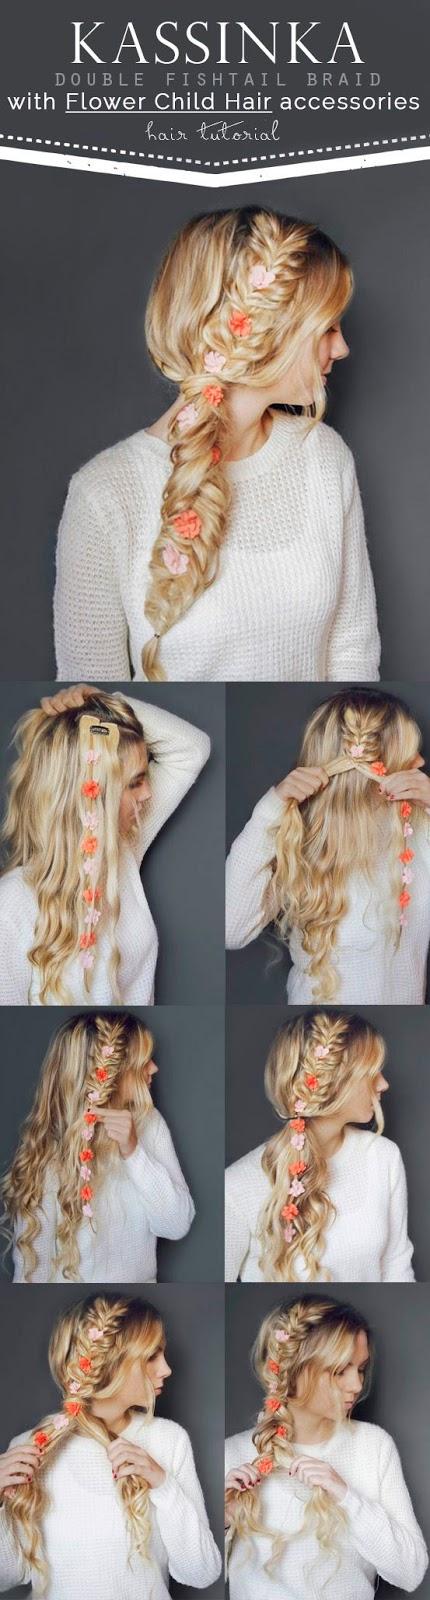 beautiful braid hair style idea